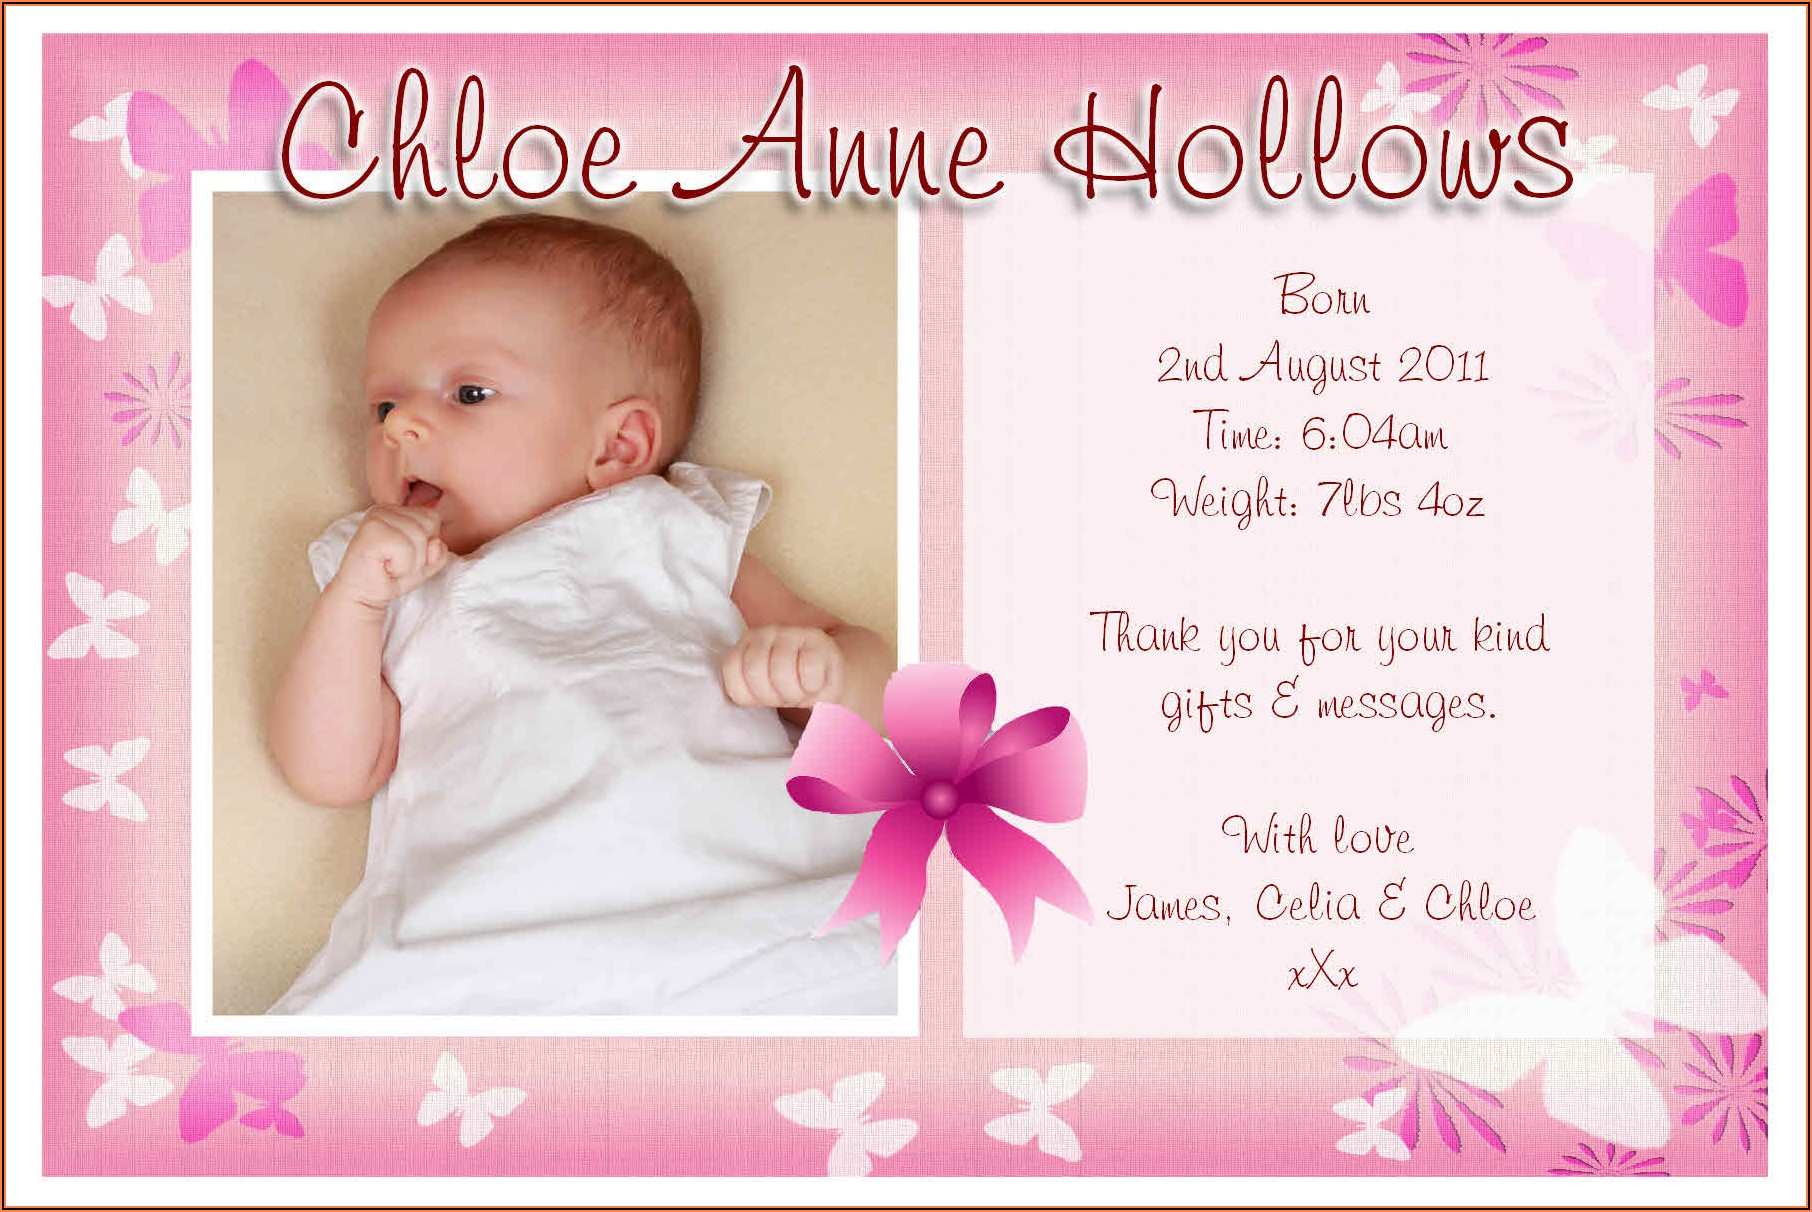 Cute Baby Arrival Announcement Captions